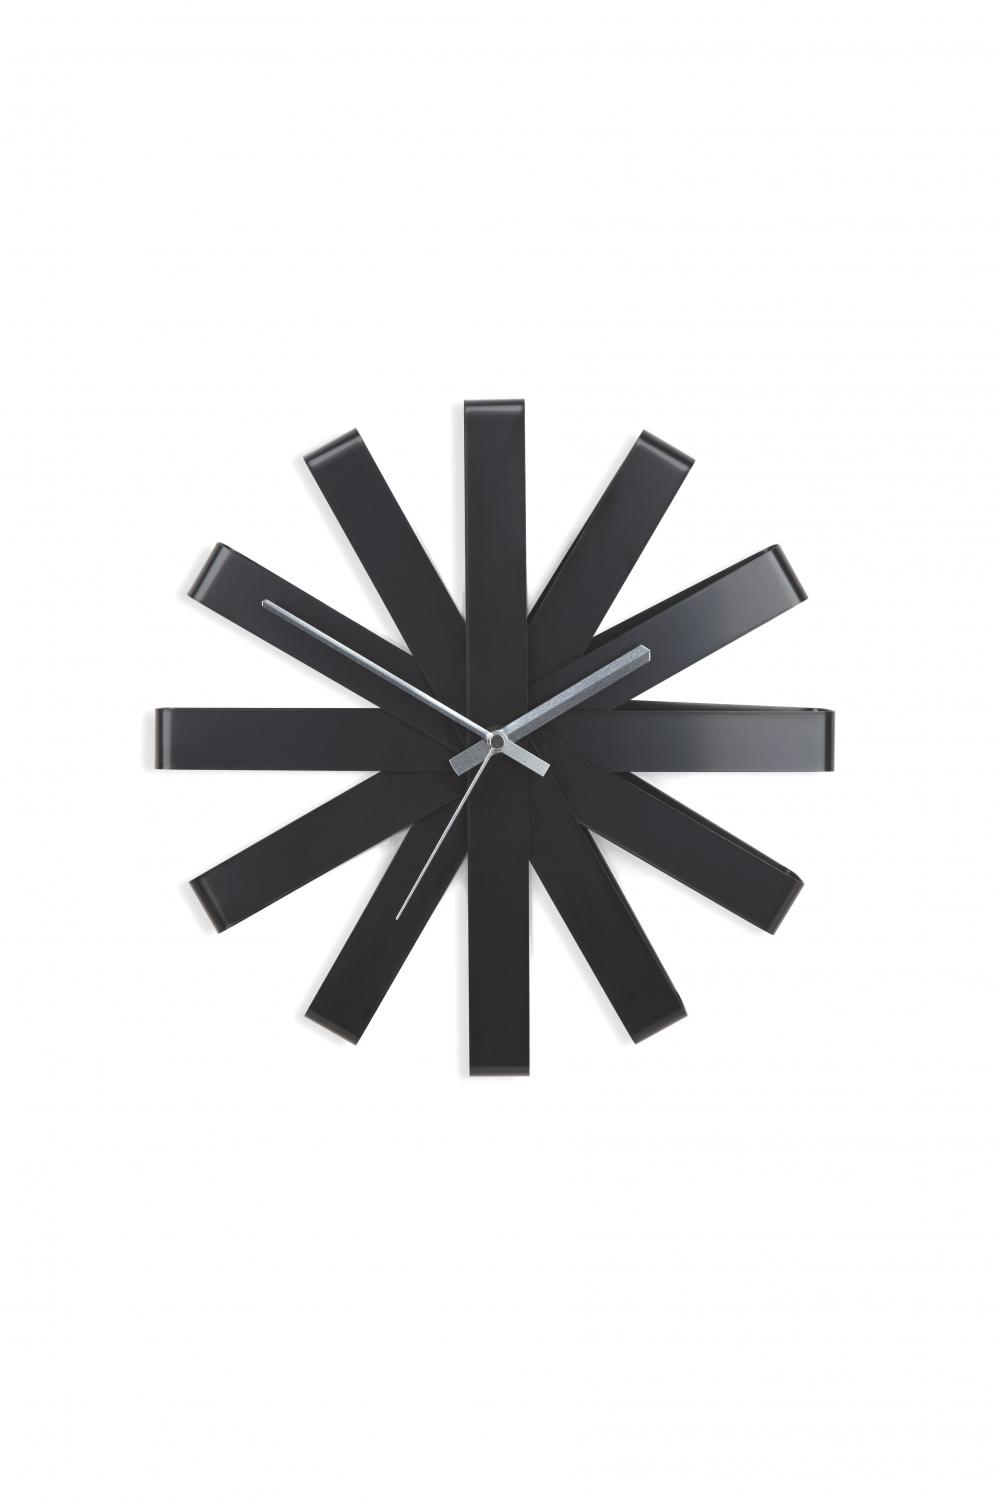 Ceas de perete Ribonne 12 inci negru imagine 2021 insignis.ro